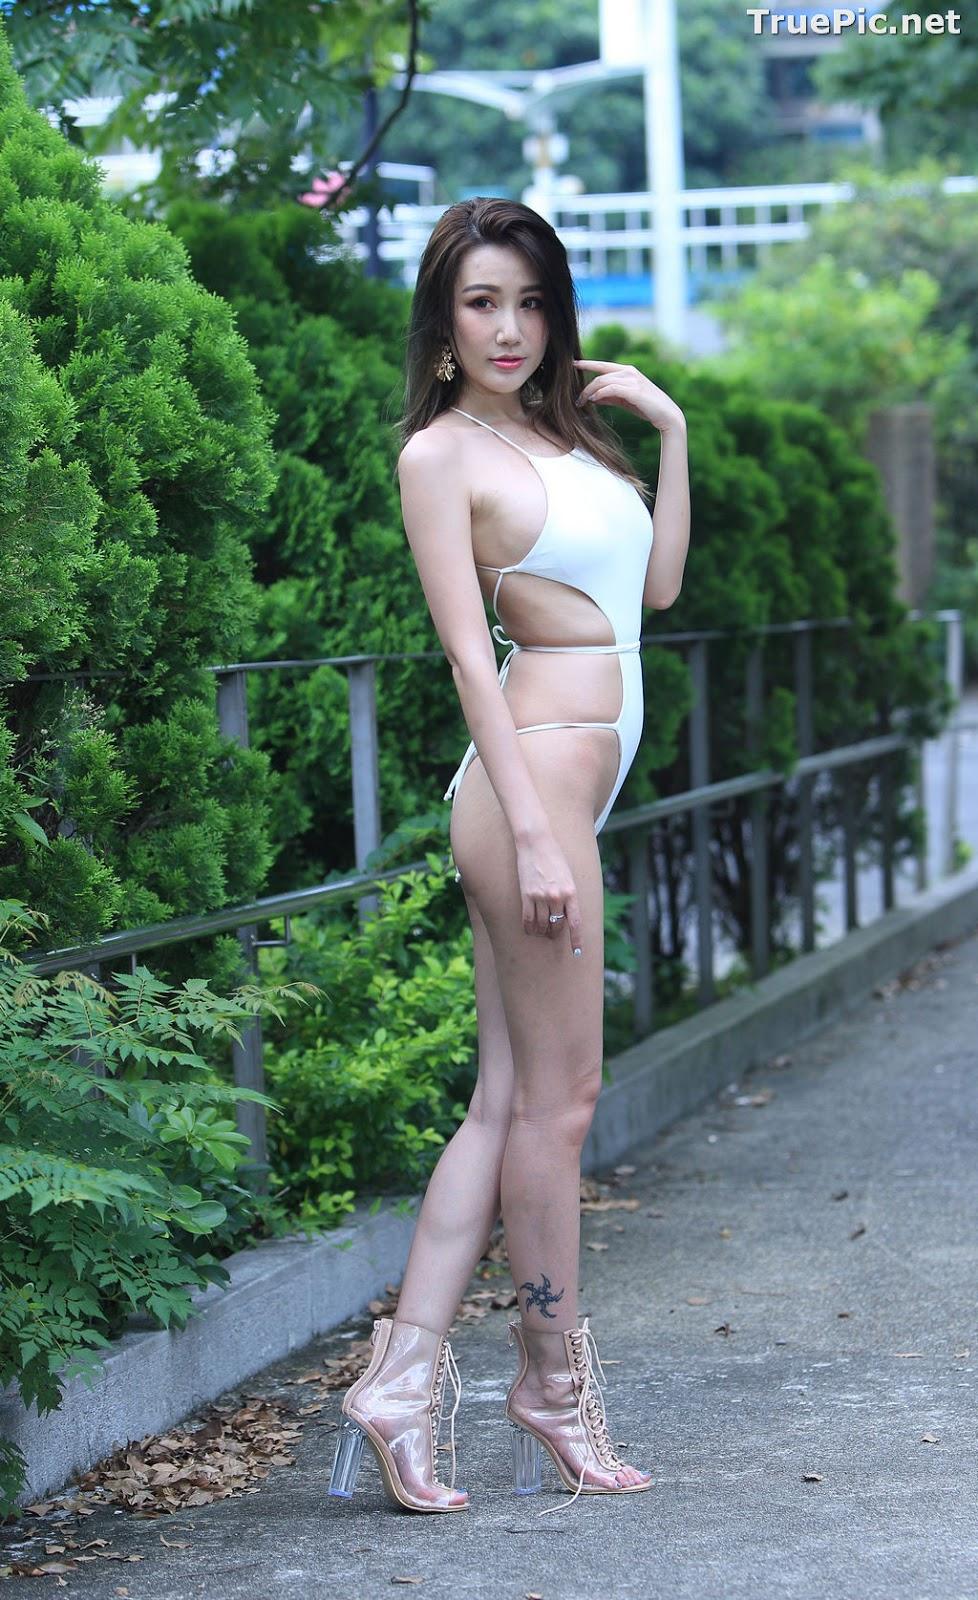 Image Taiwanese Beautiful Model - Suki - White Sexy Bikini Girl - TruePic.net - Picture-3